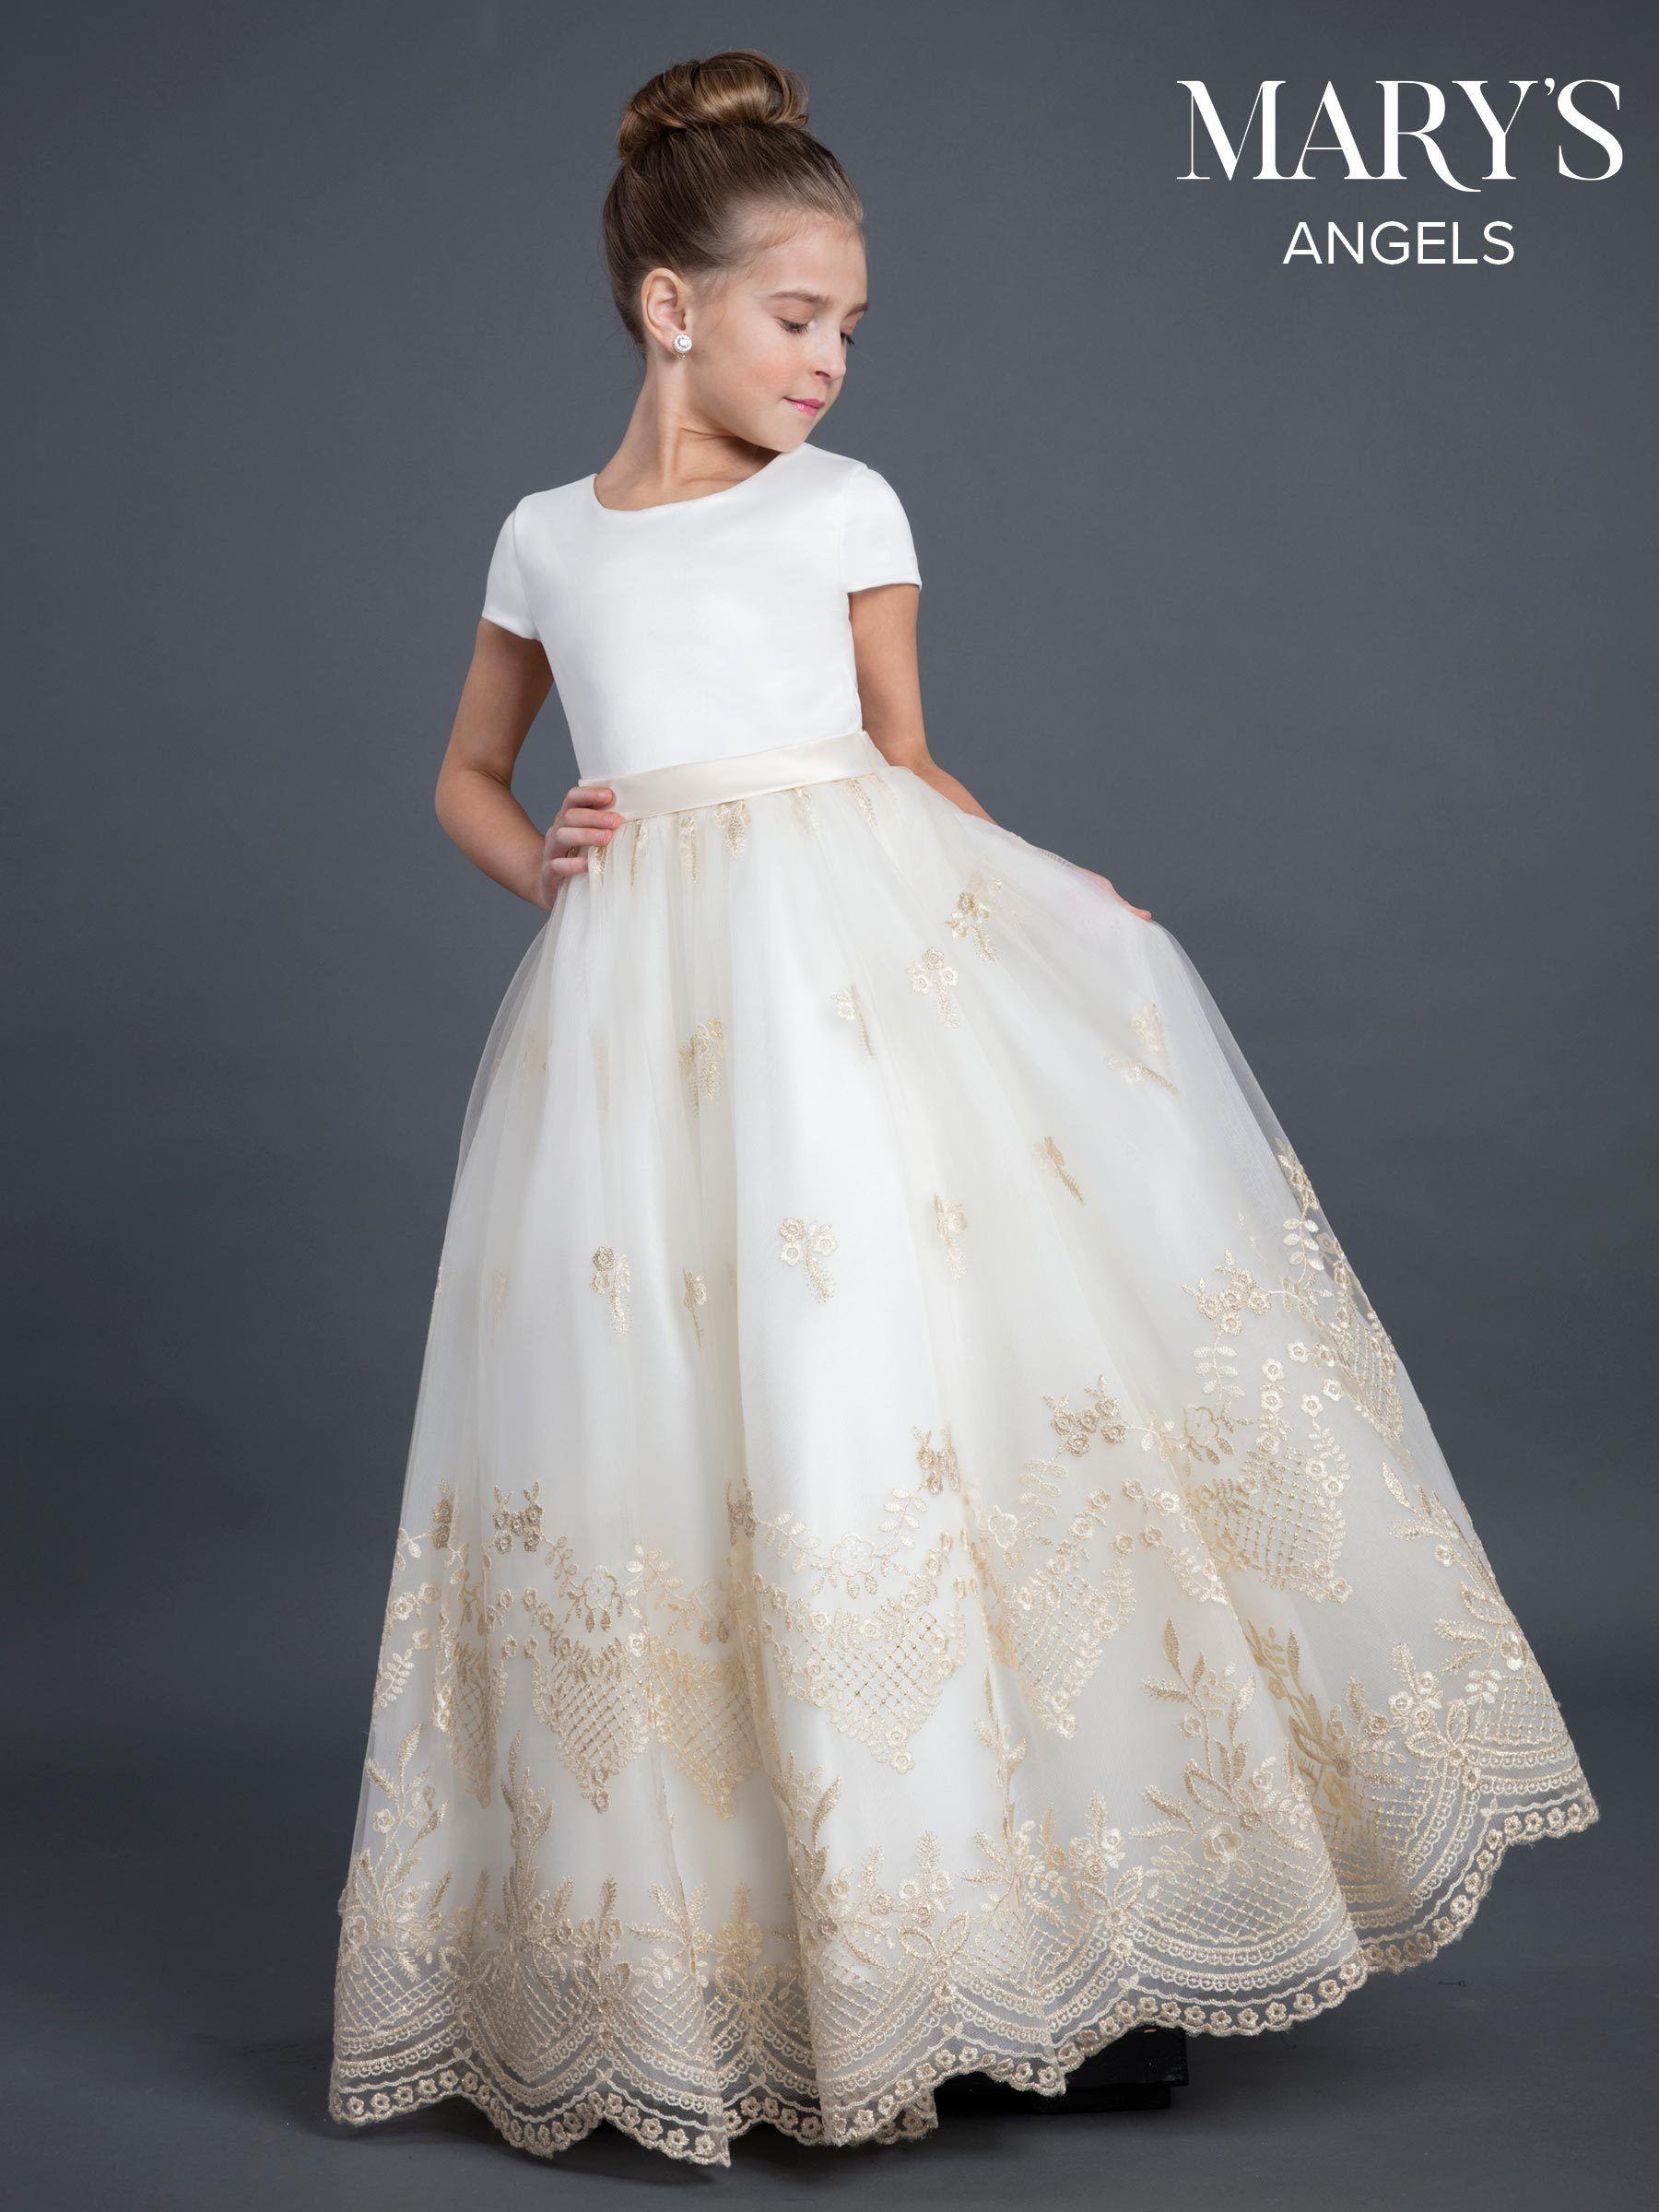 Girls Long Applique Short Sleeve Dress By Mary S Bridal Mb9026 In 2021 Satin Flower Girl Dress Girls Ball Gown Girls Communion Dresses [ 2400 x 1800 Pixel ]